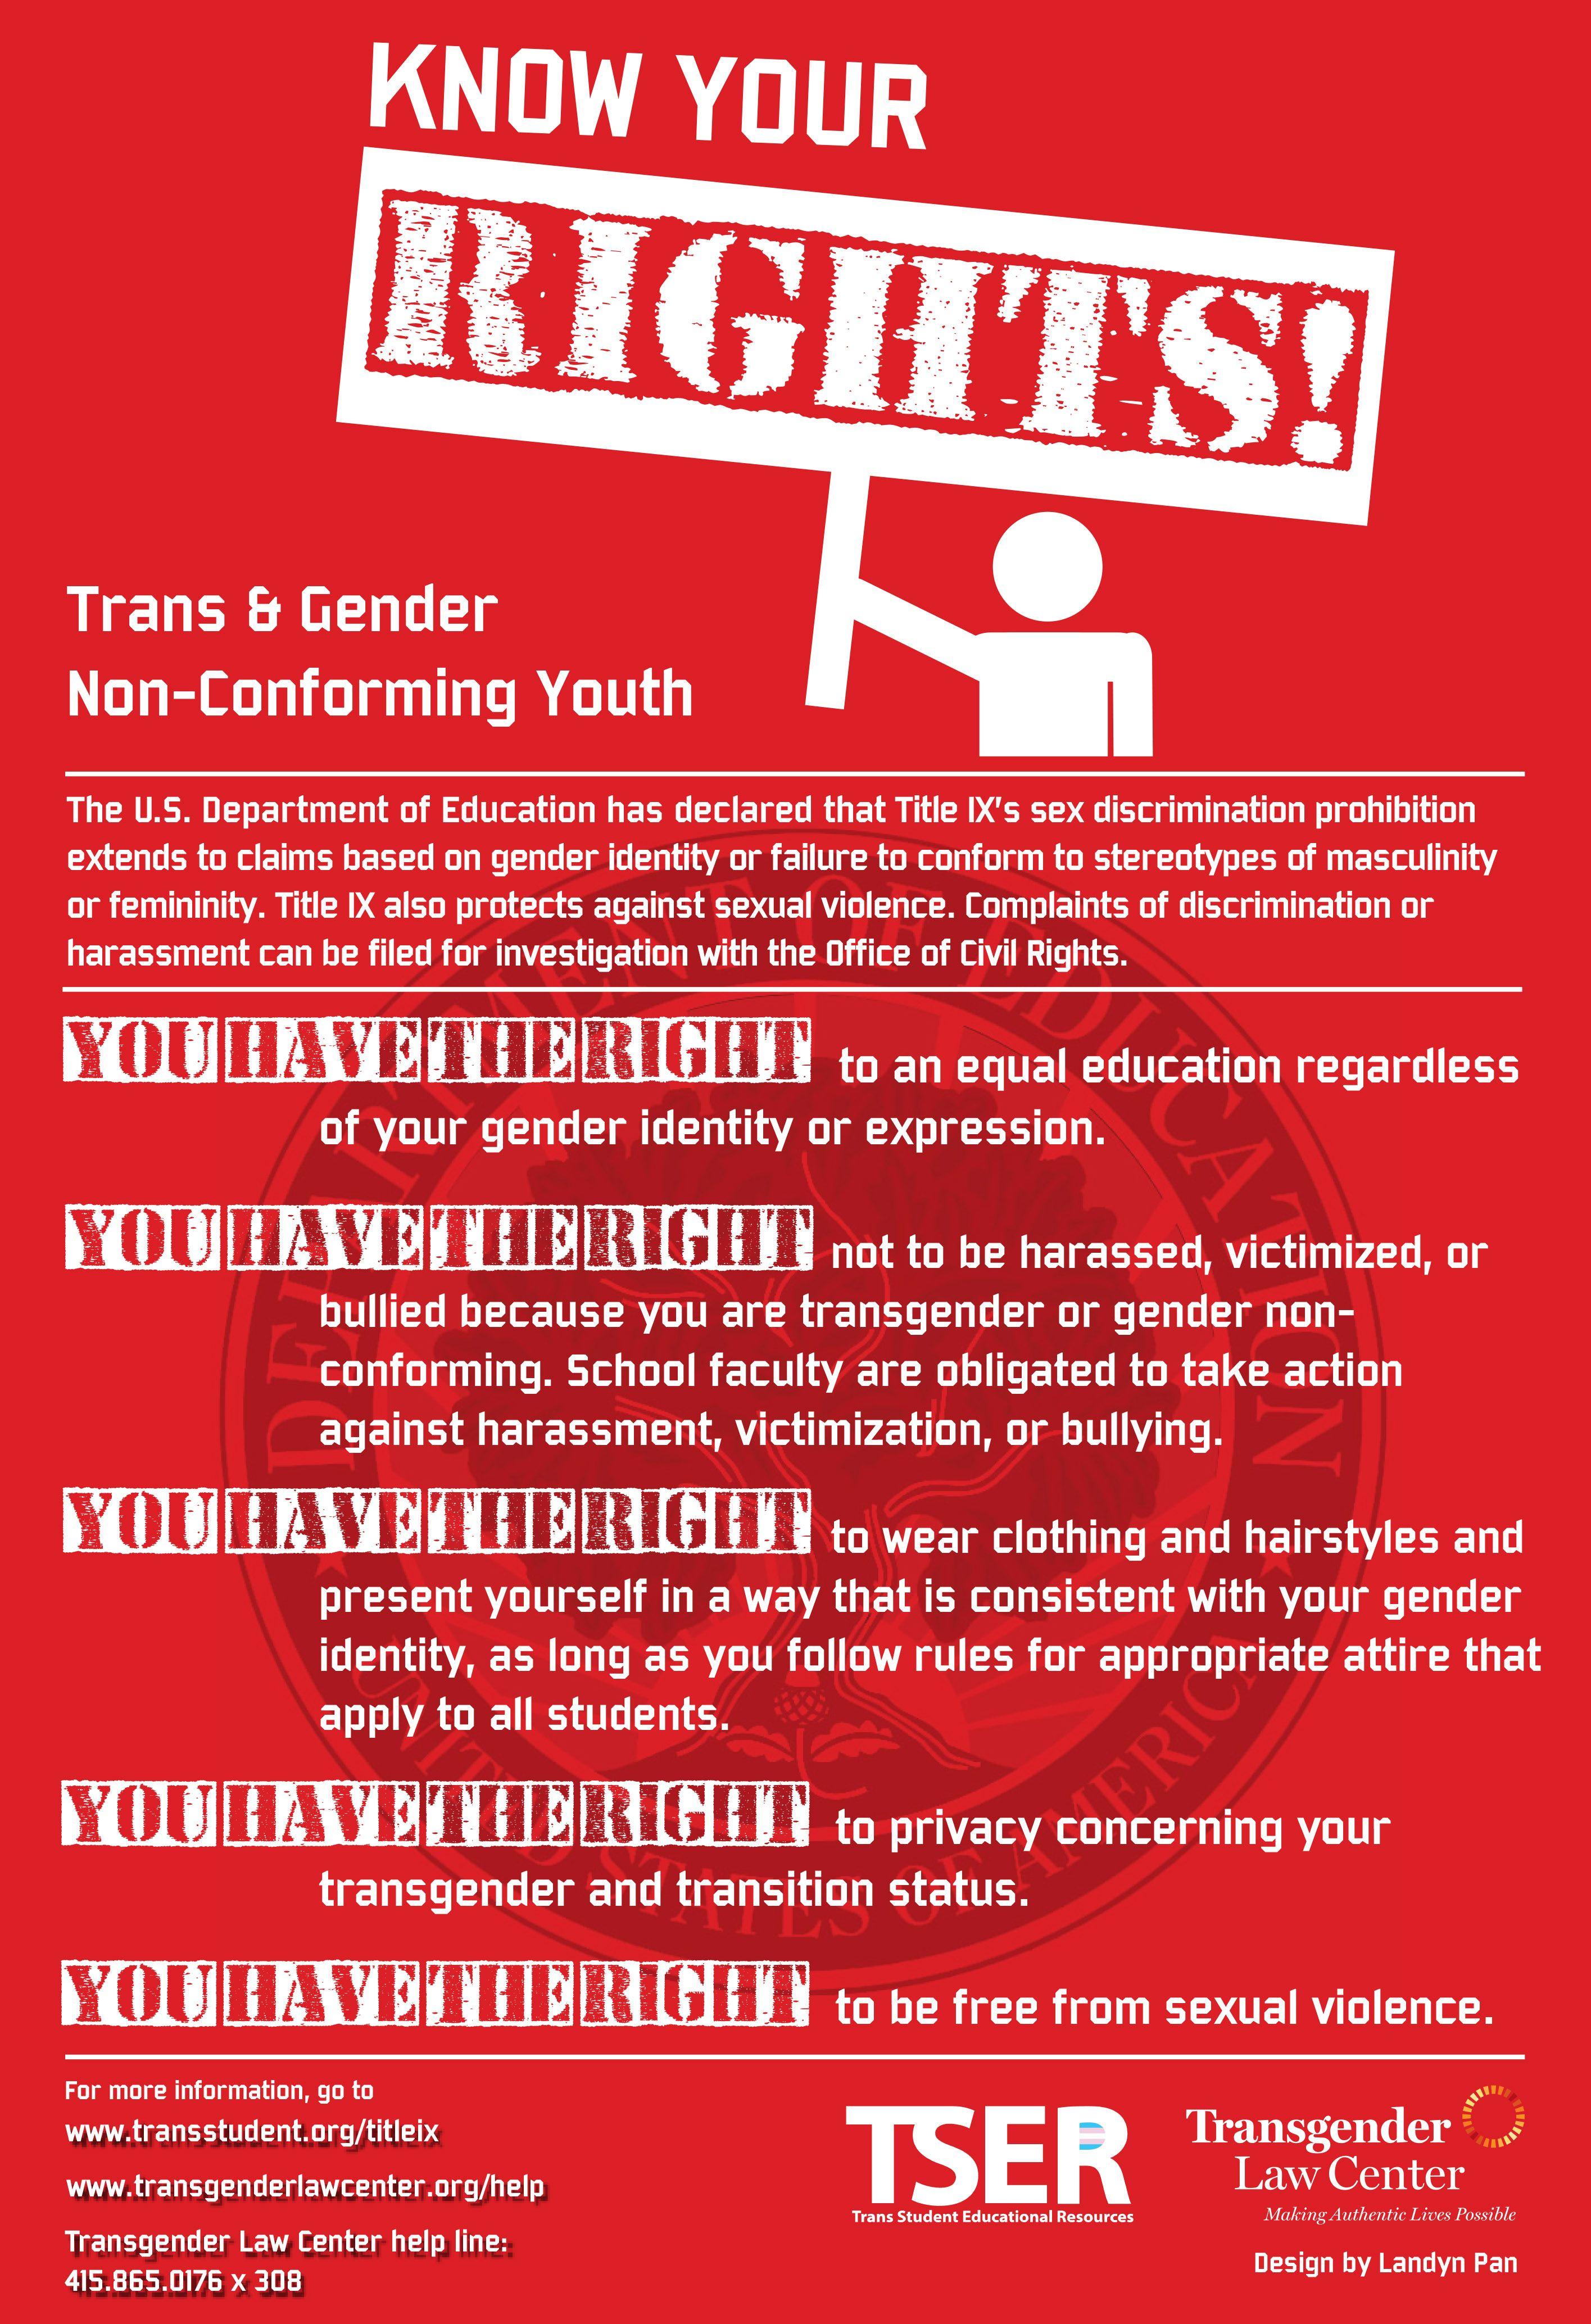 title ix � trans student educational resources